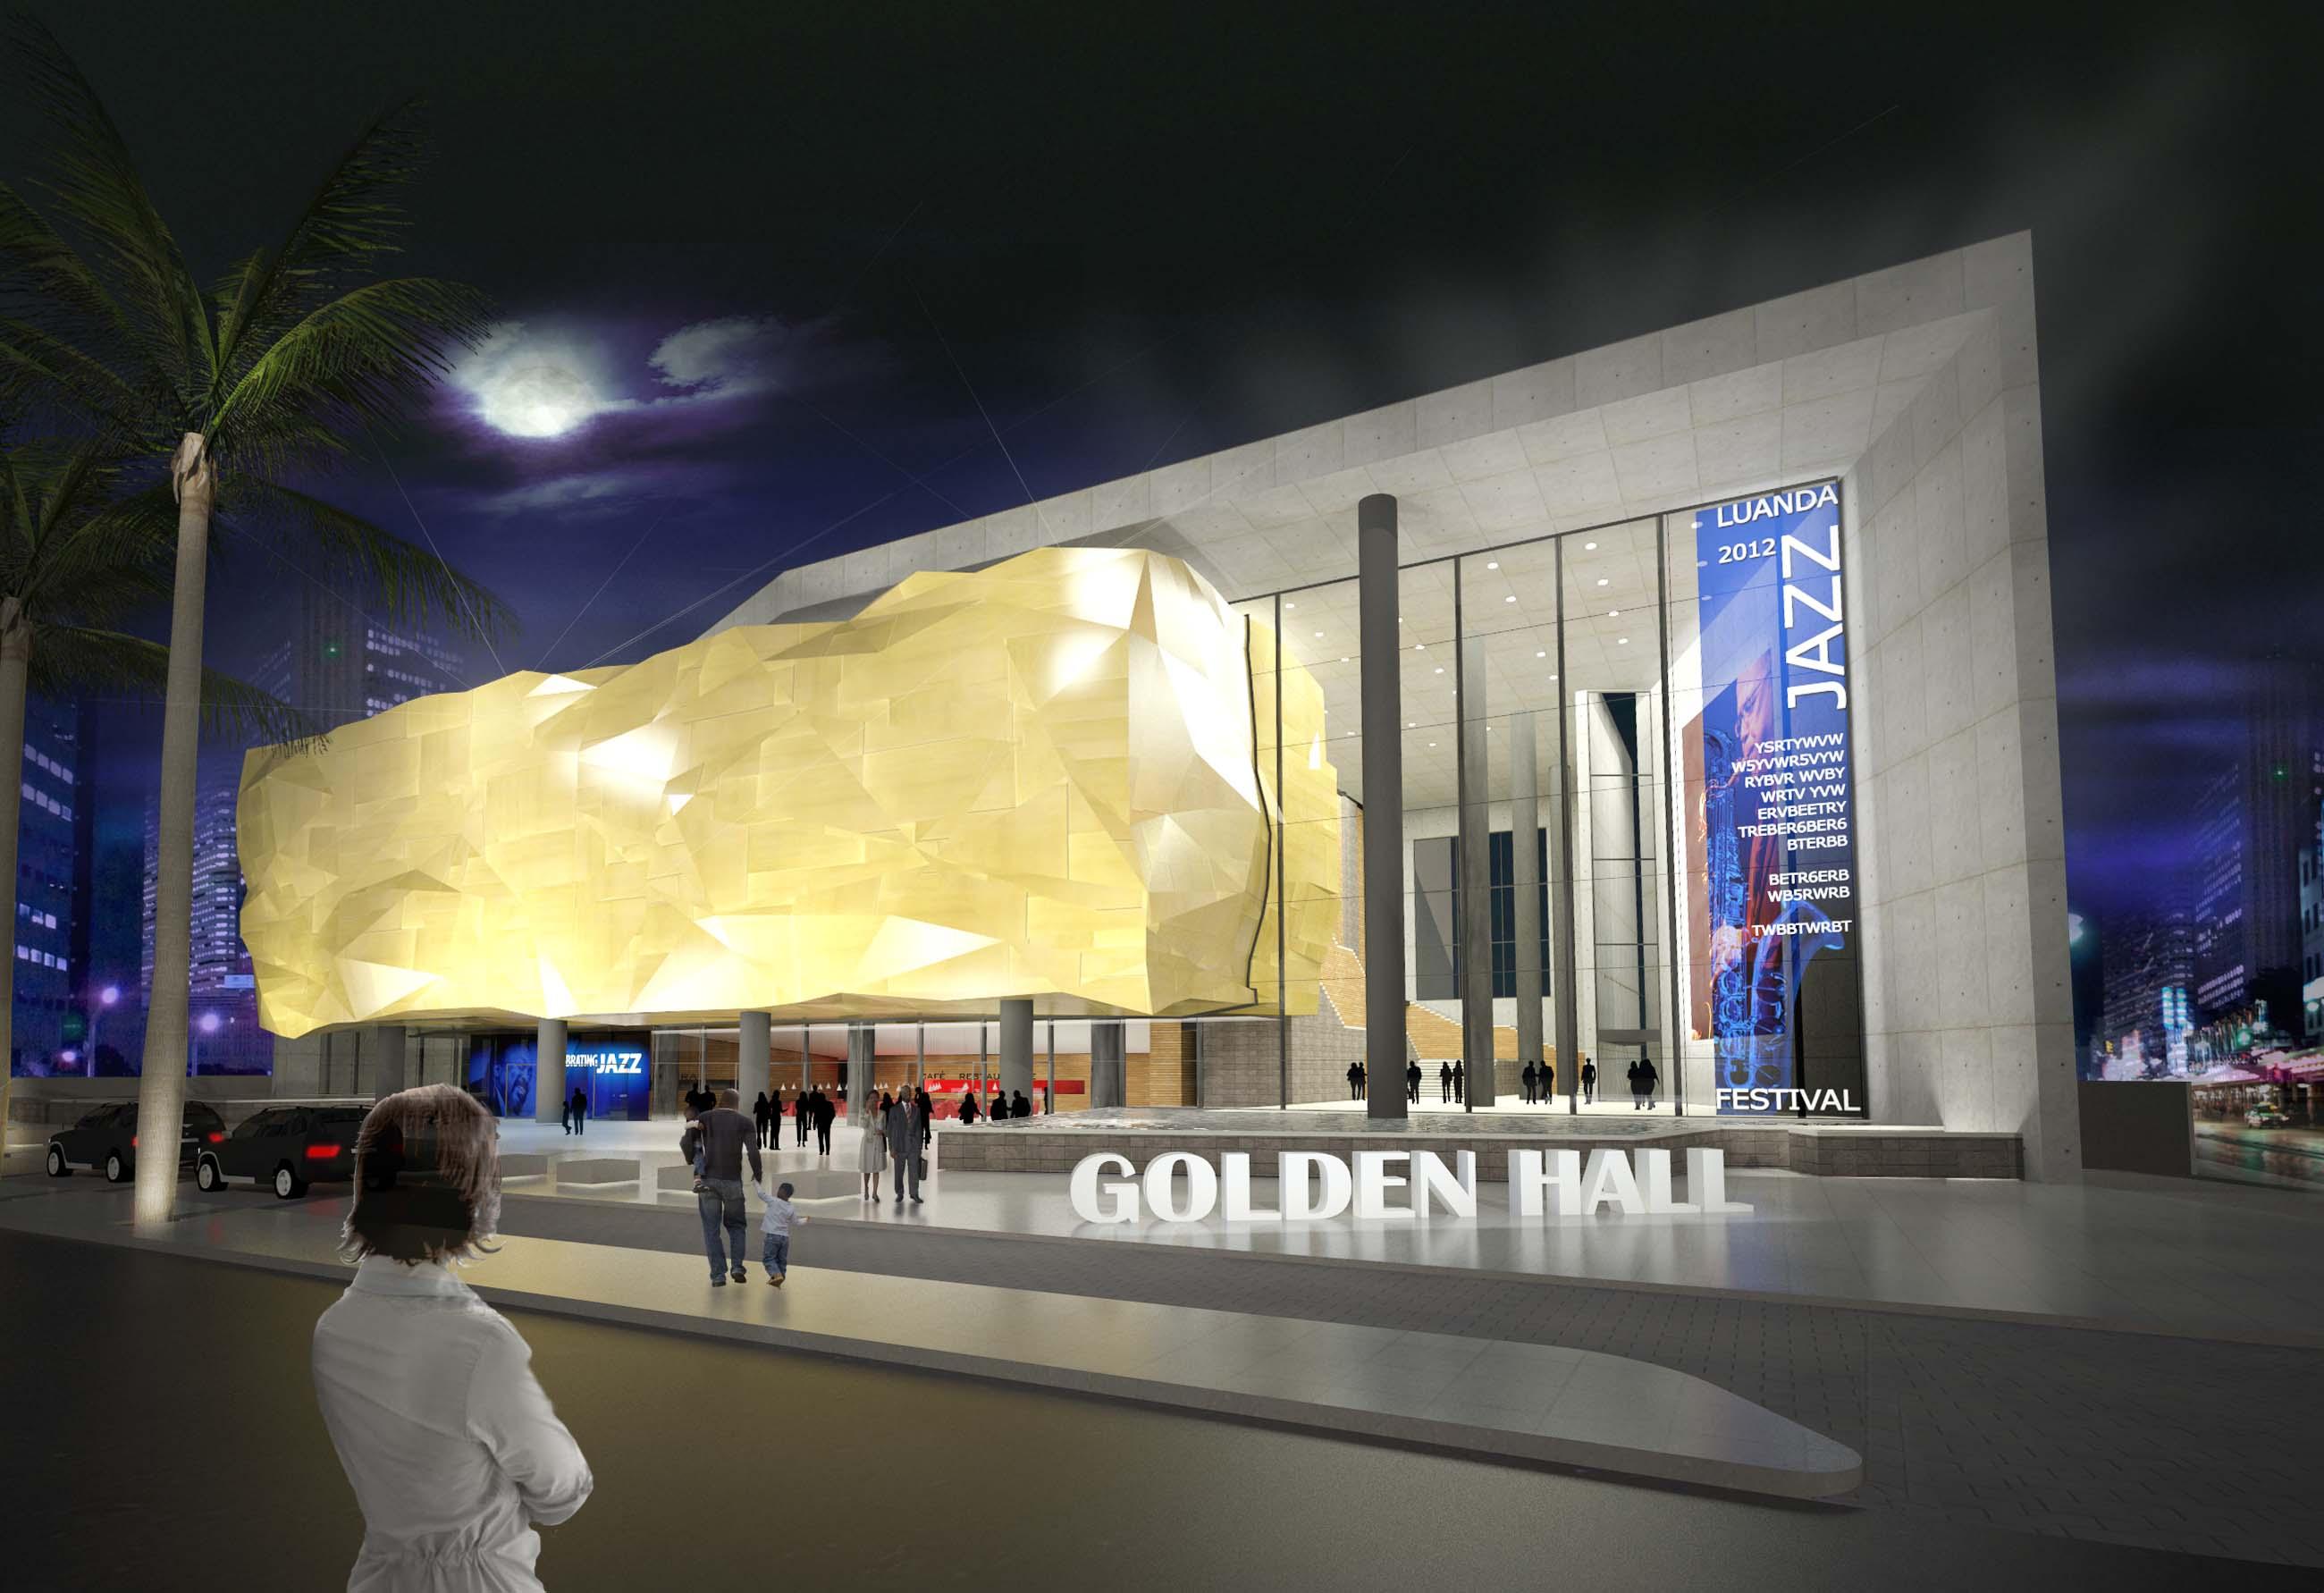 GOLDEN HALL01